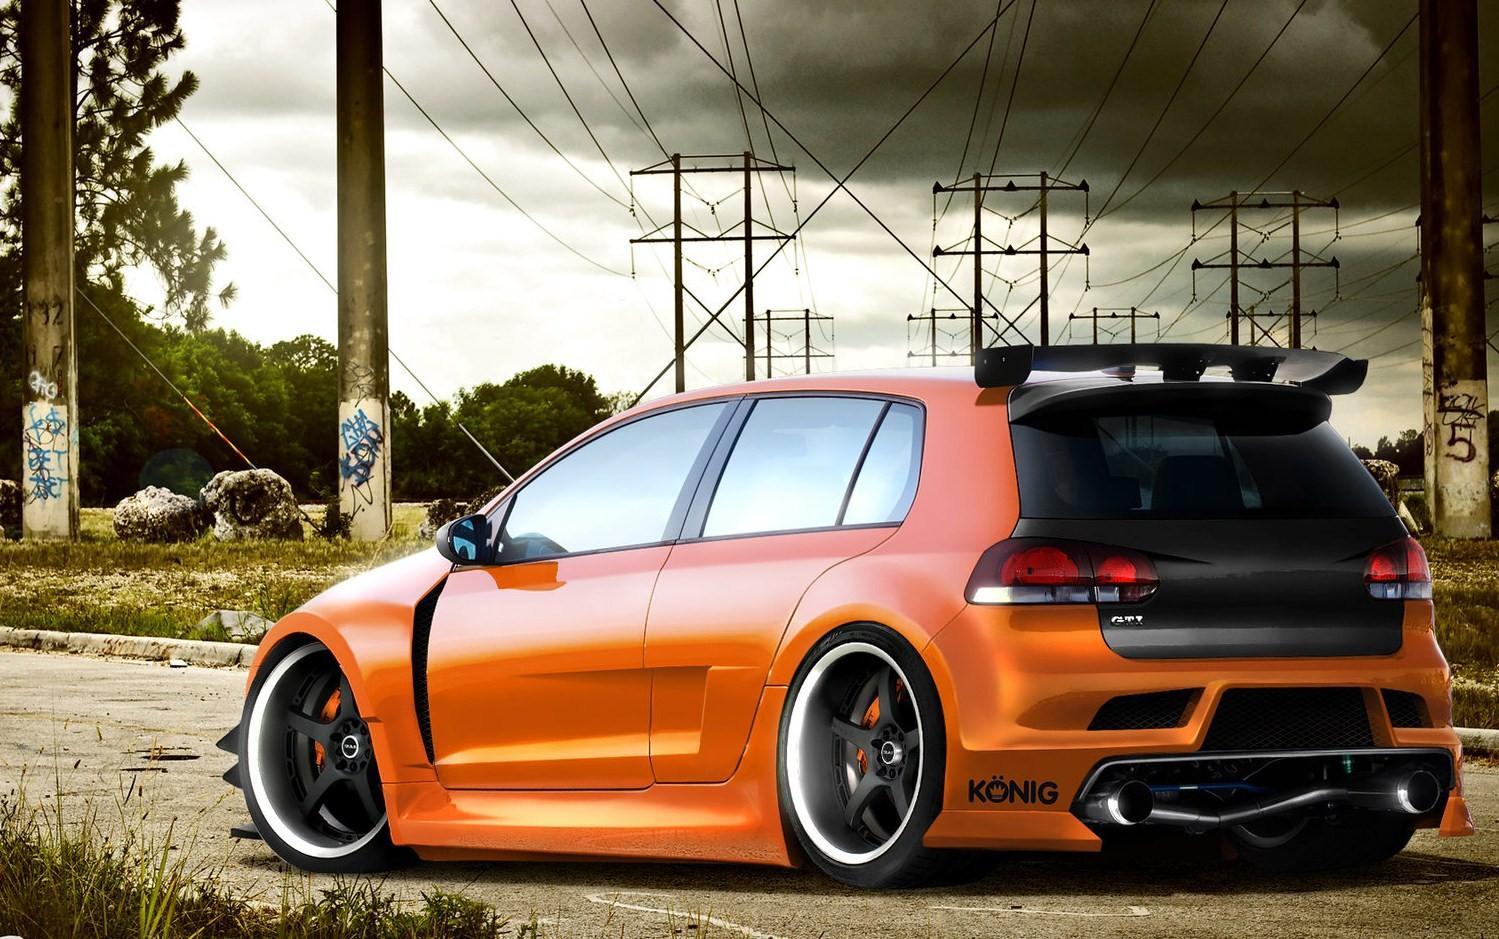 Reglage De Fond D Ecran Golf Mk6 Fond D Ecran Volkswagen 1499x939 Wallpapertip